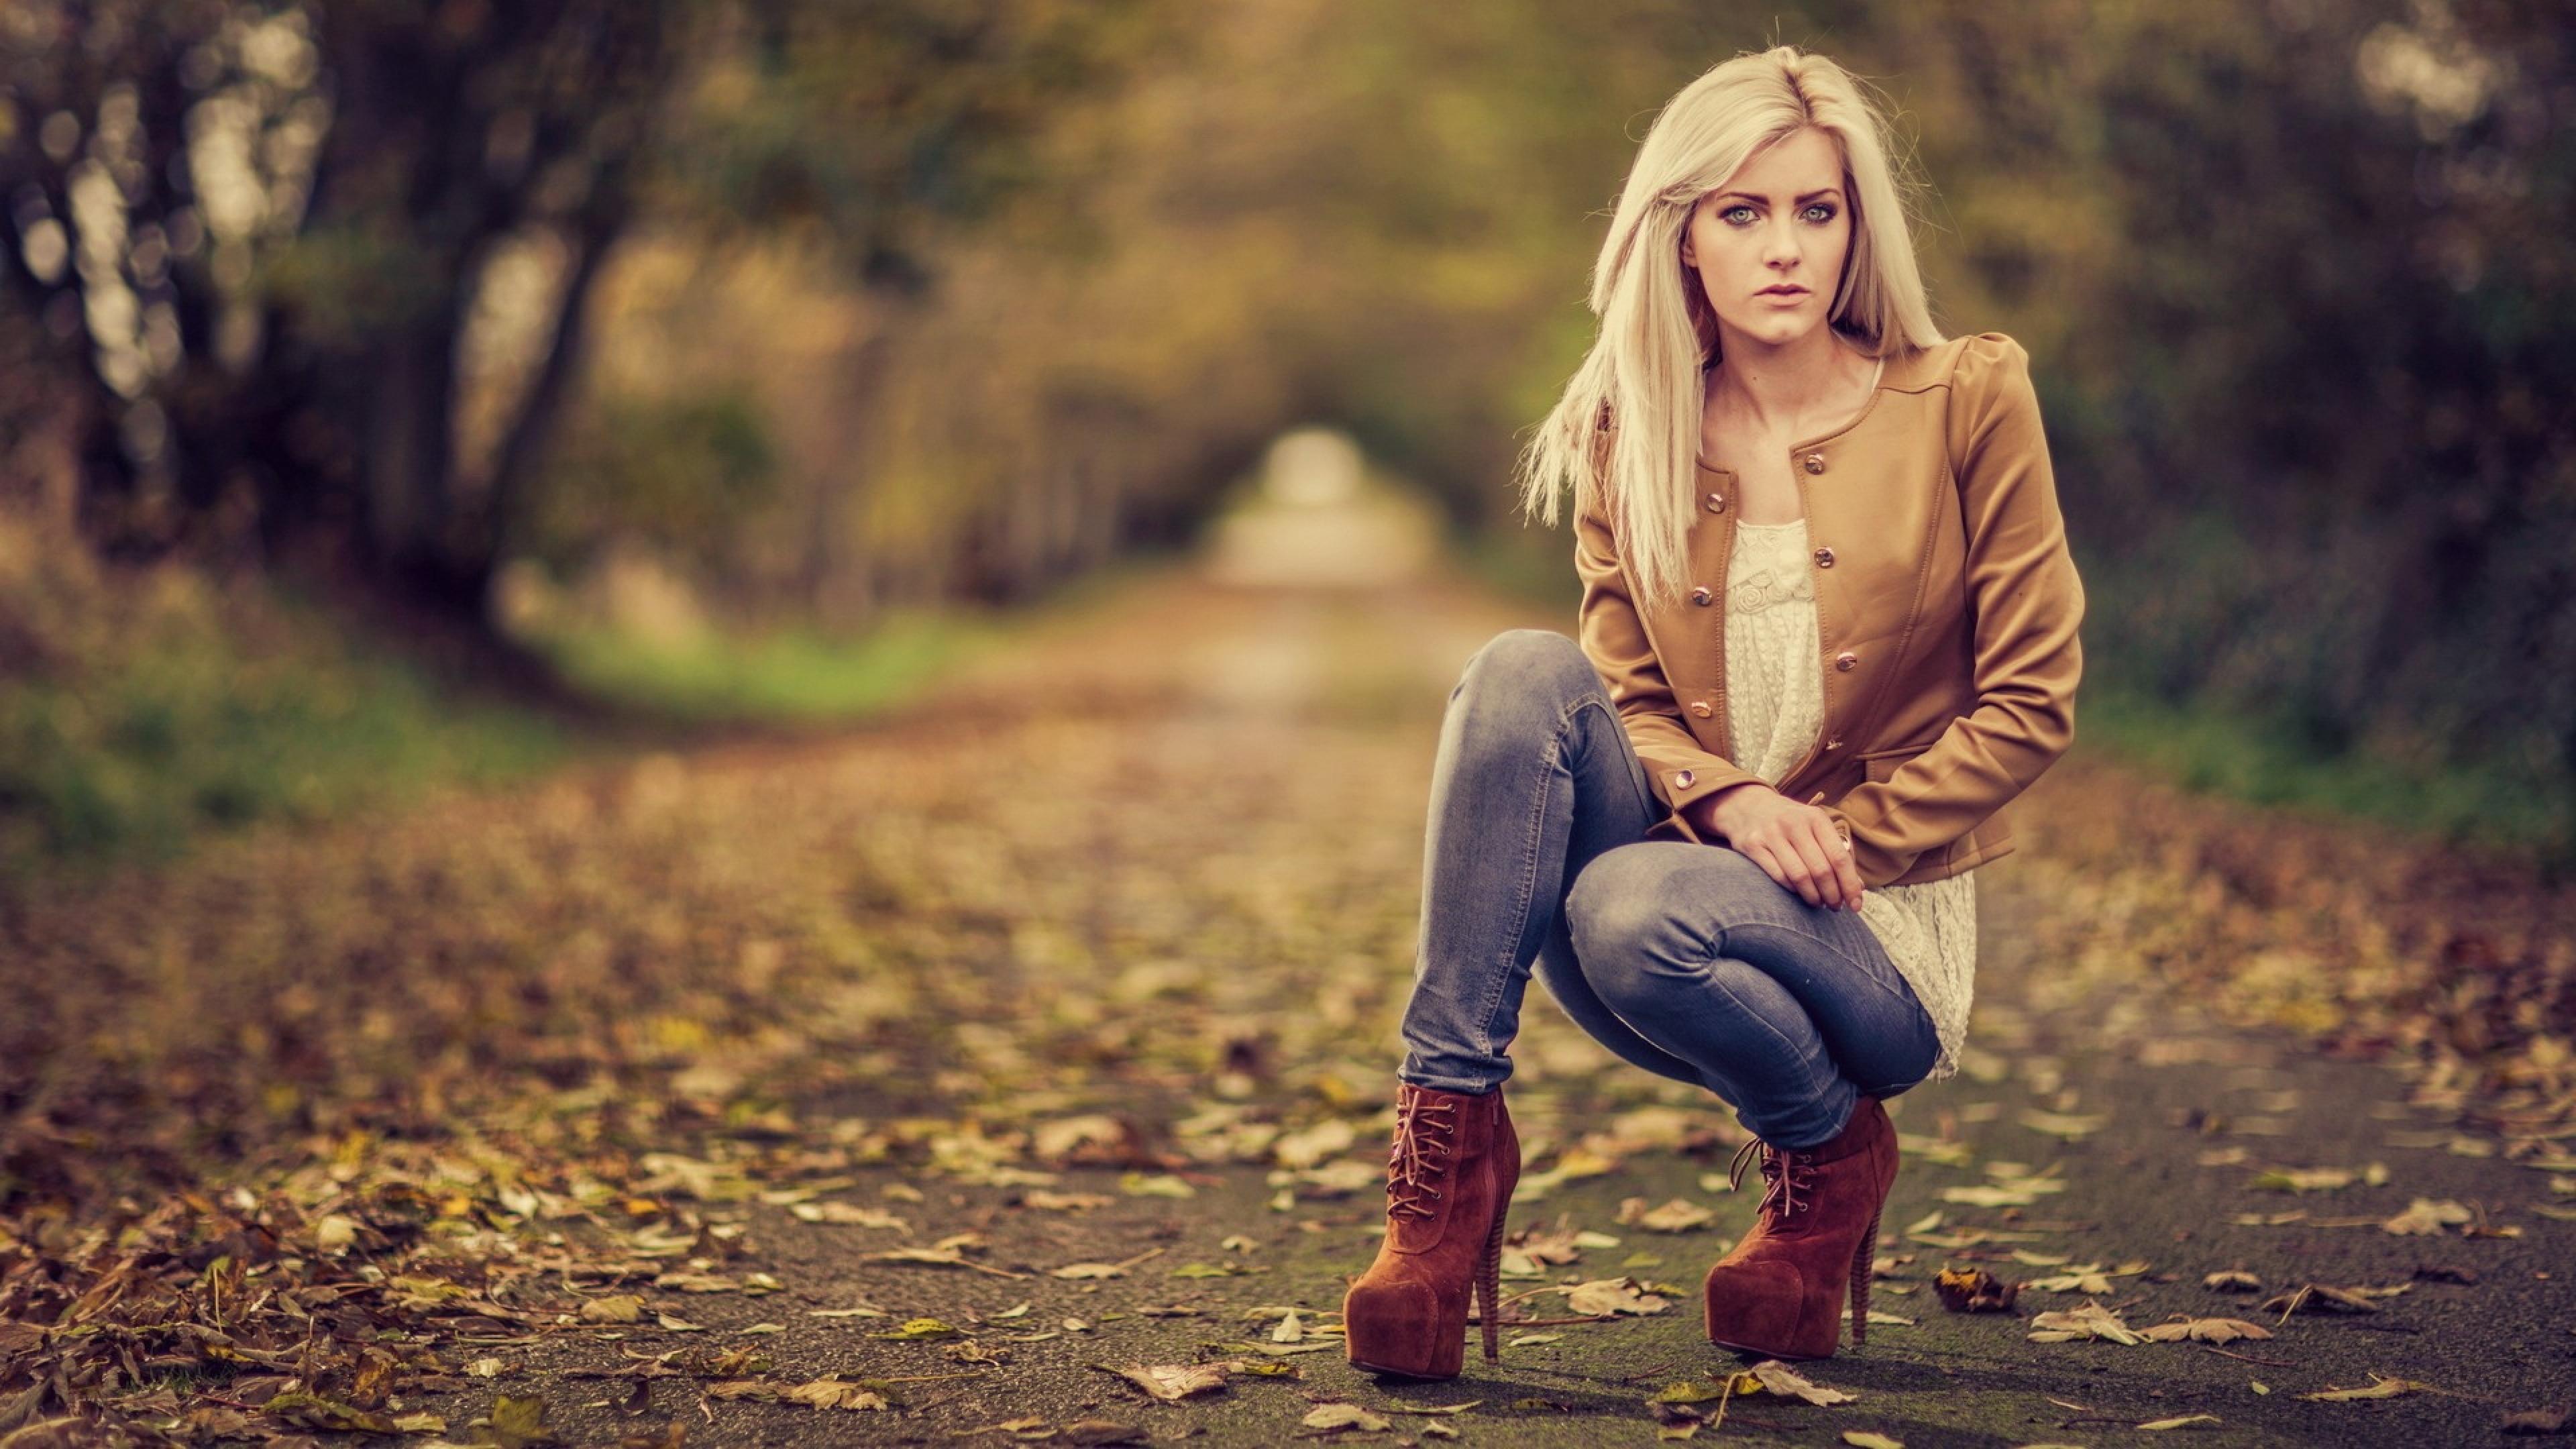 autumn leaves model girl 1575665256 - Autumn Leaves Model Girl -